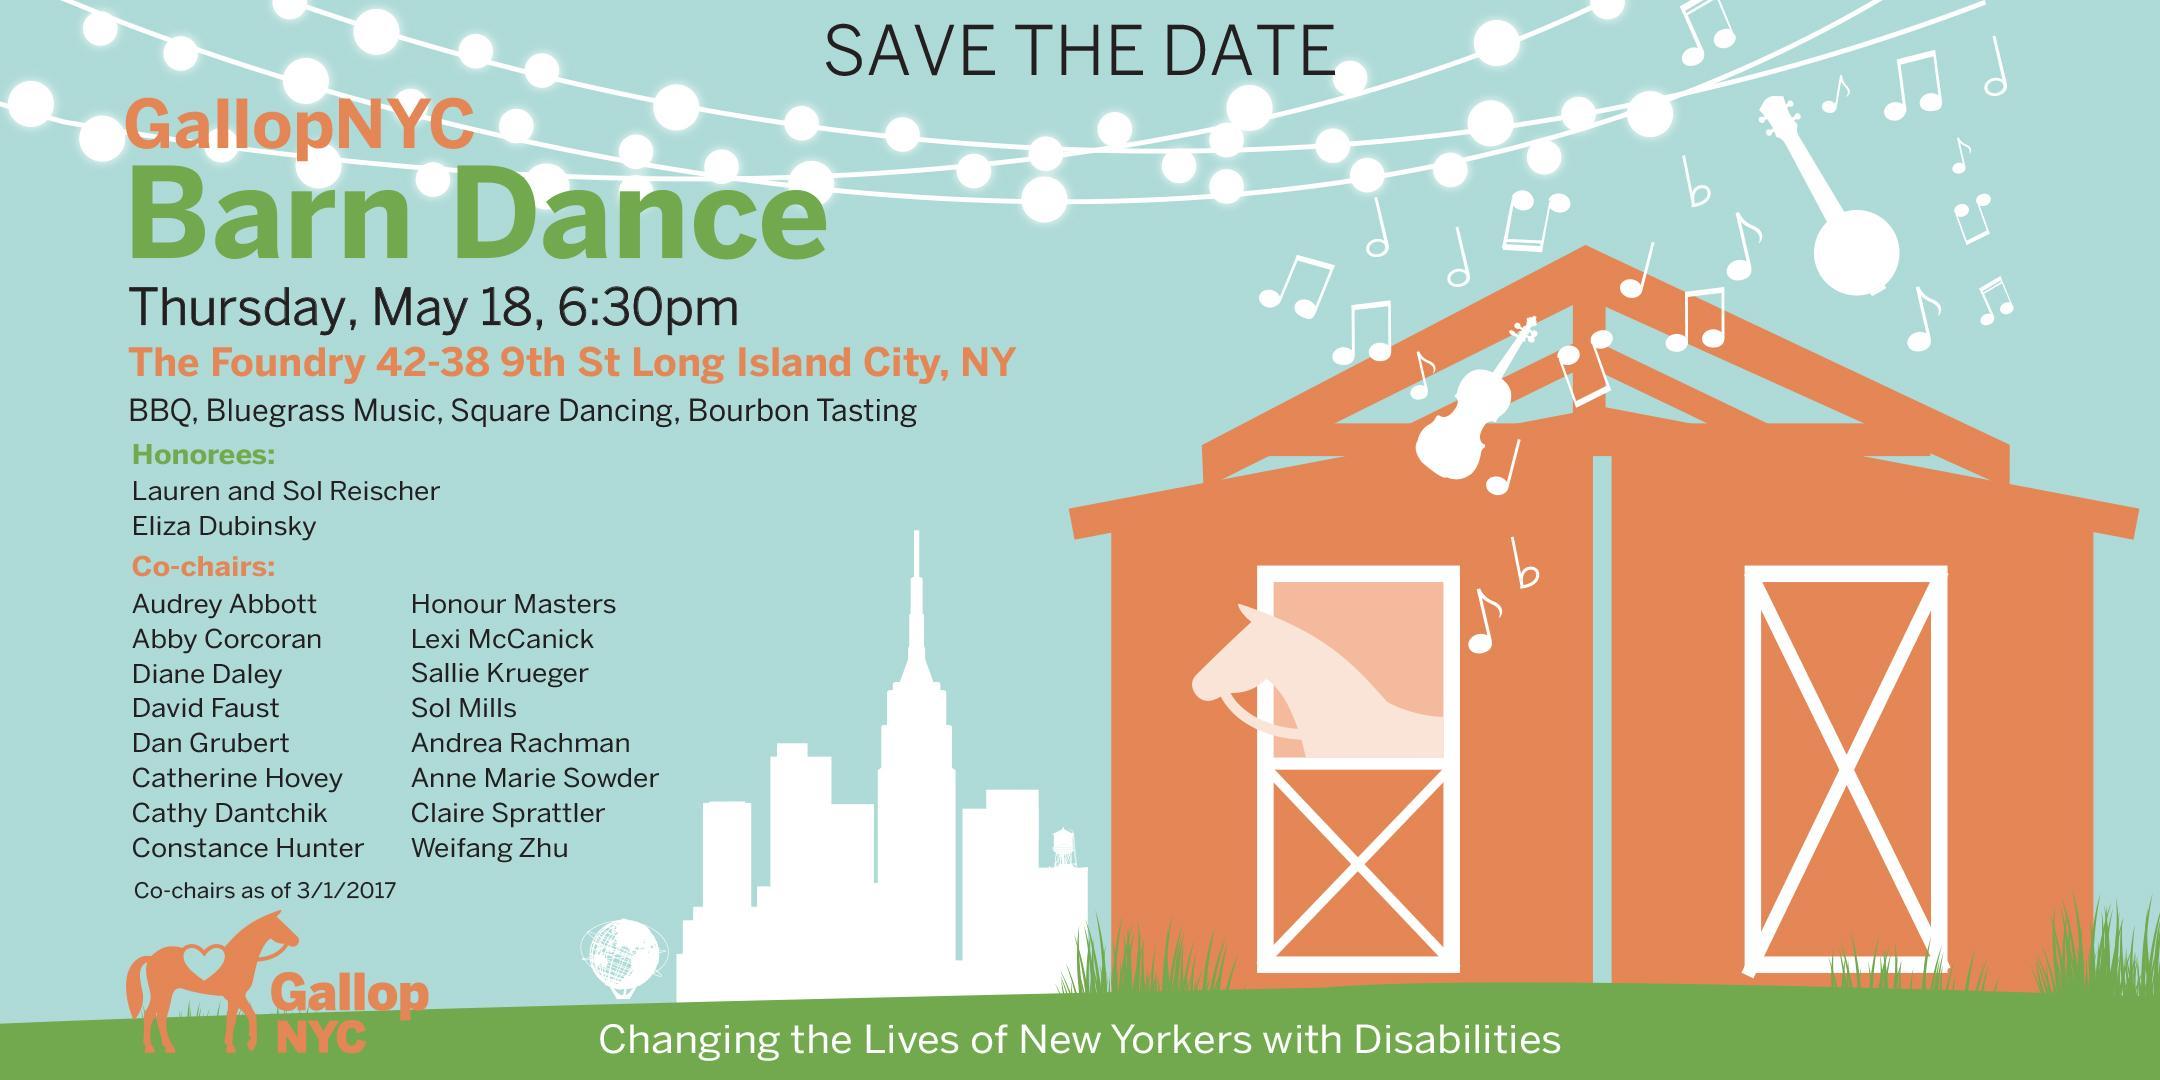 2017 GallopNYC Barn Dance